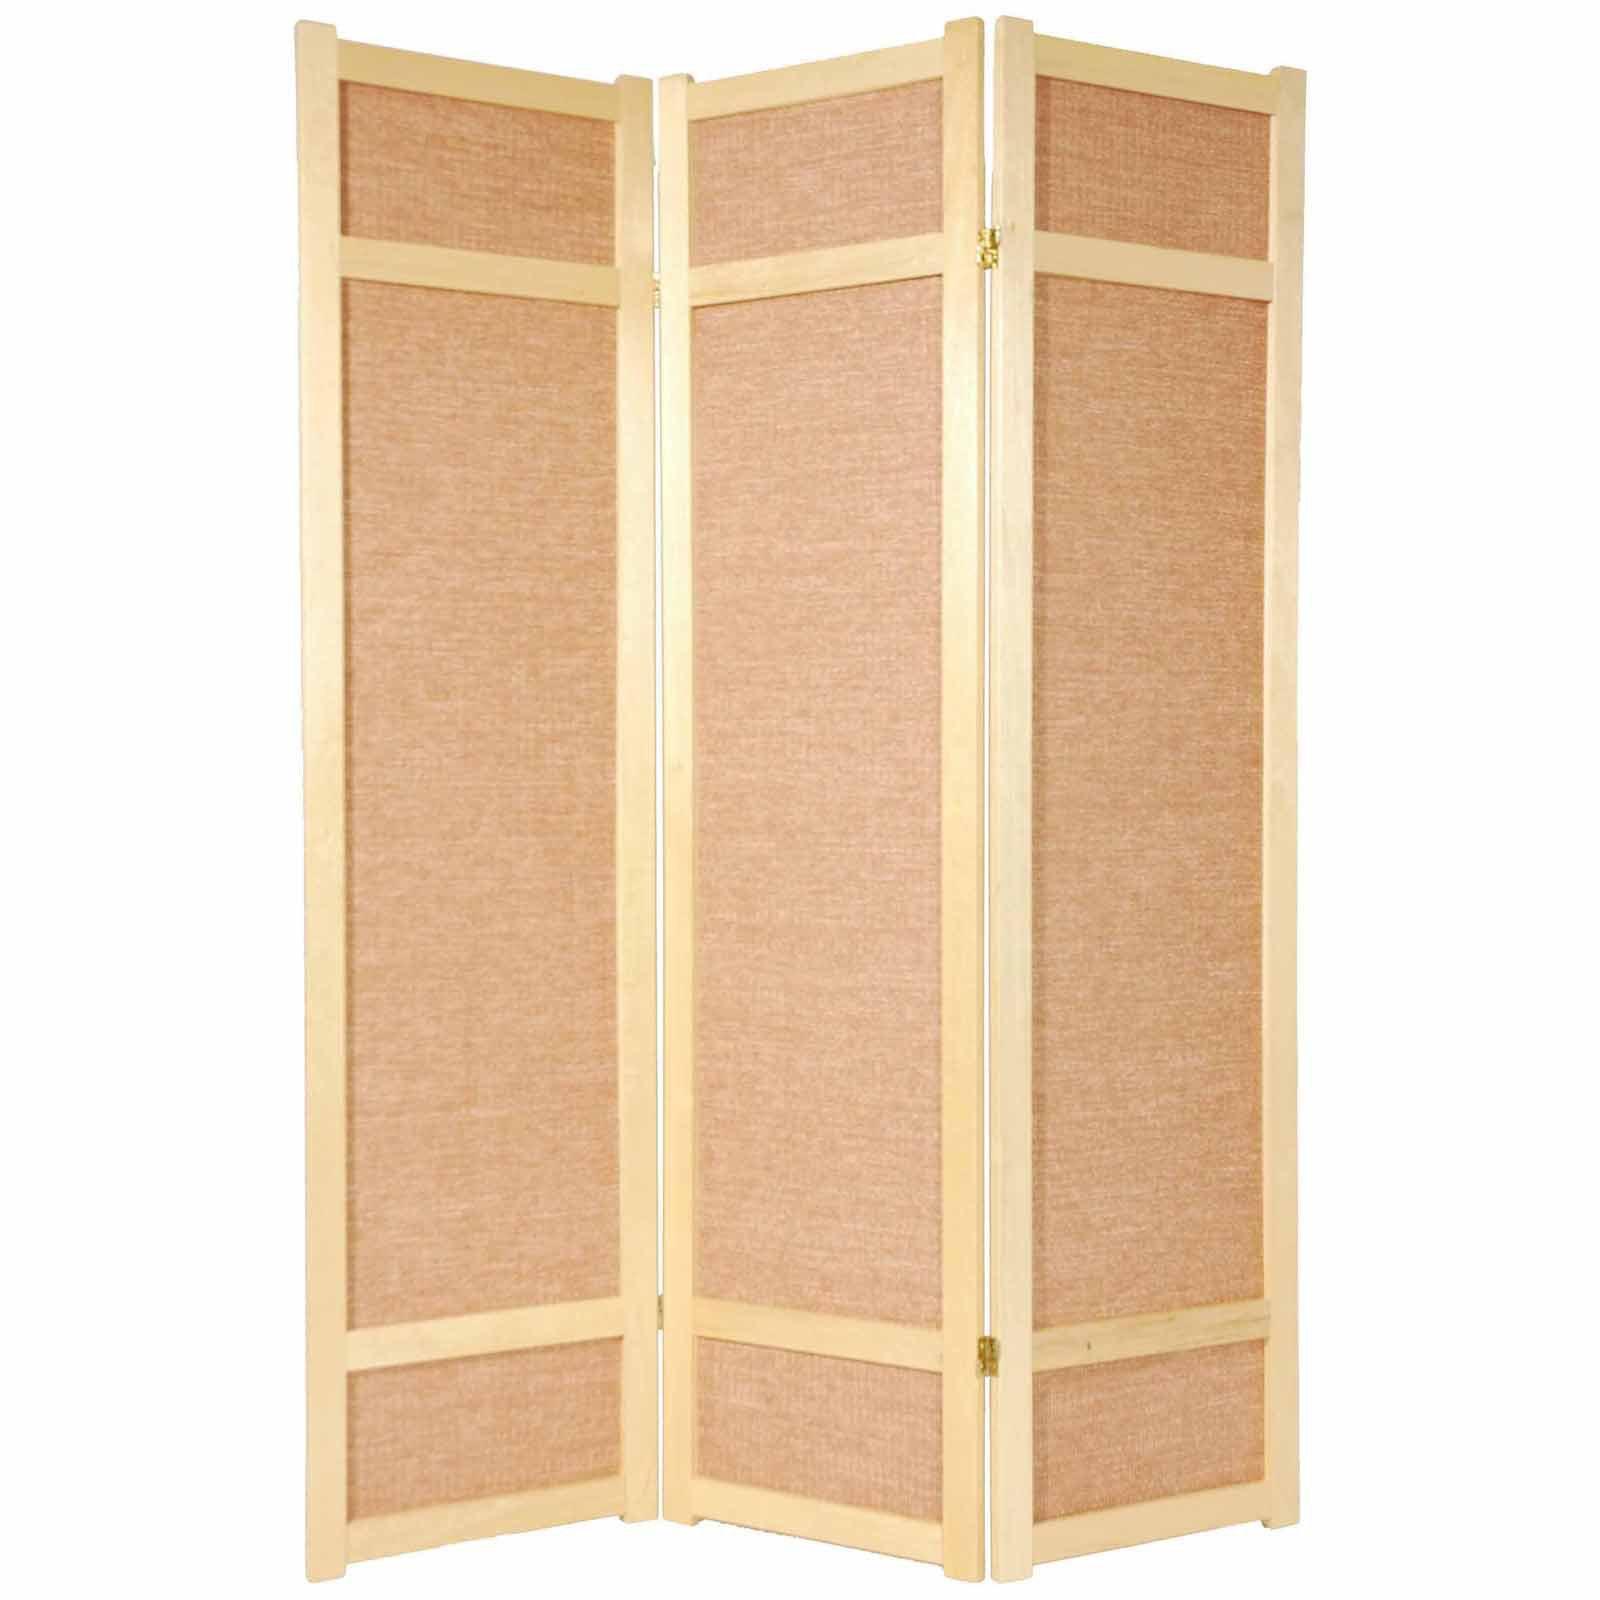 Oriental Furniture Jute Fiber 72 Inch Room Divider